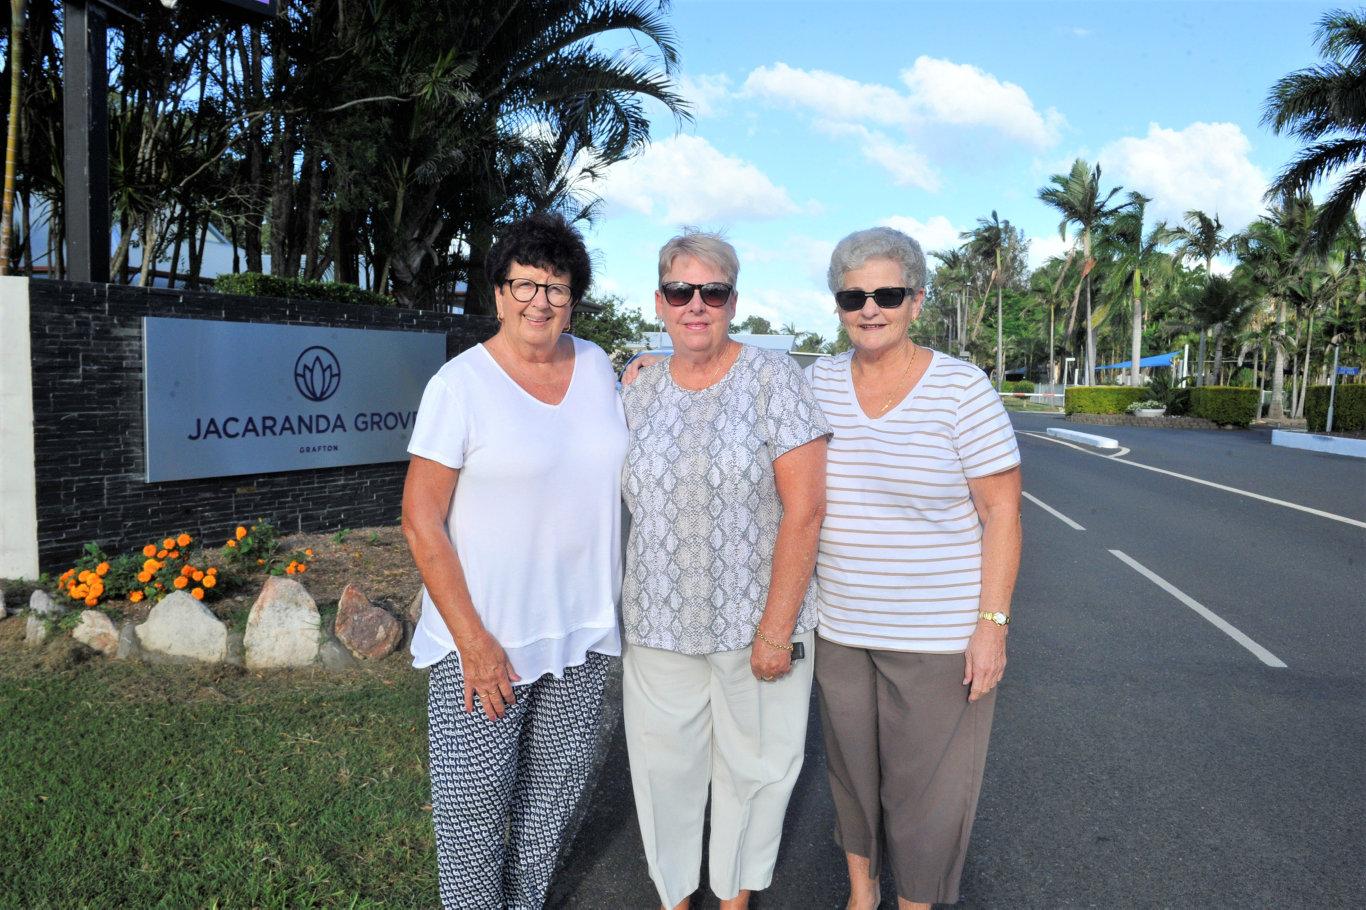 Jacaranda Grove (formerly Grafton Gateway) residents Dorothy Chorley, Sue Jacquin and Kay Martin.